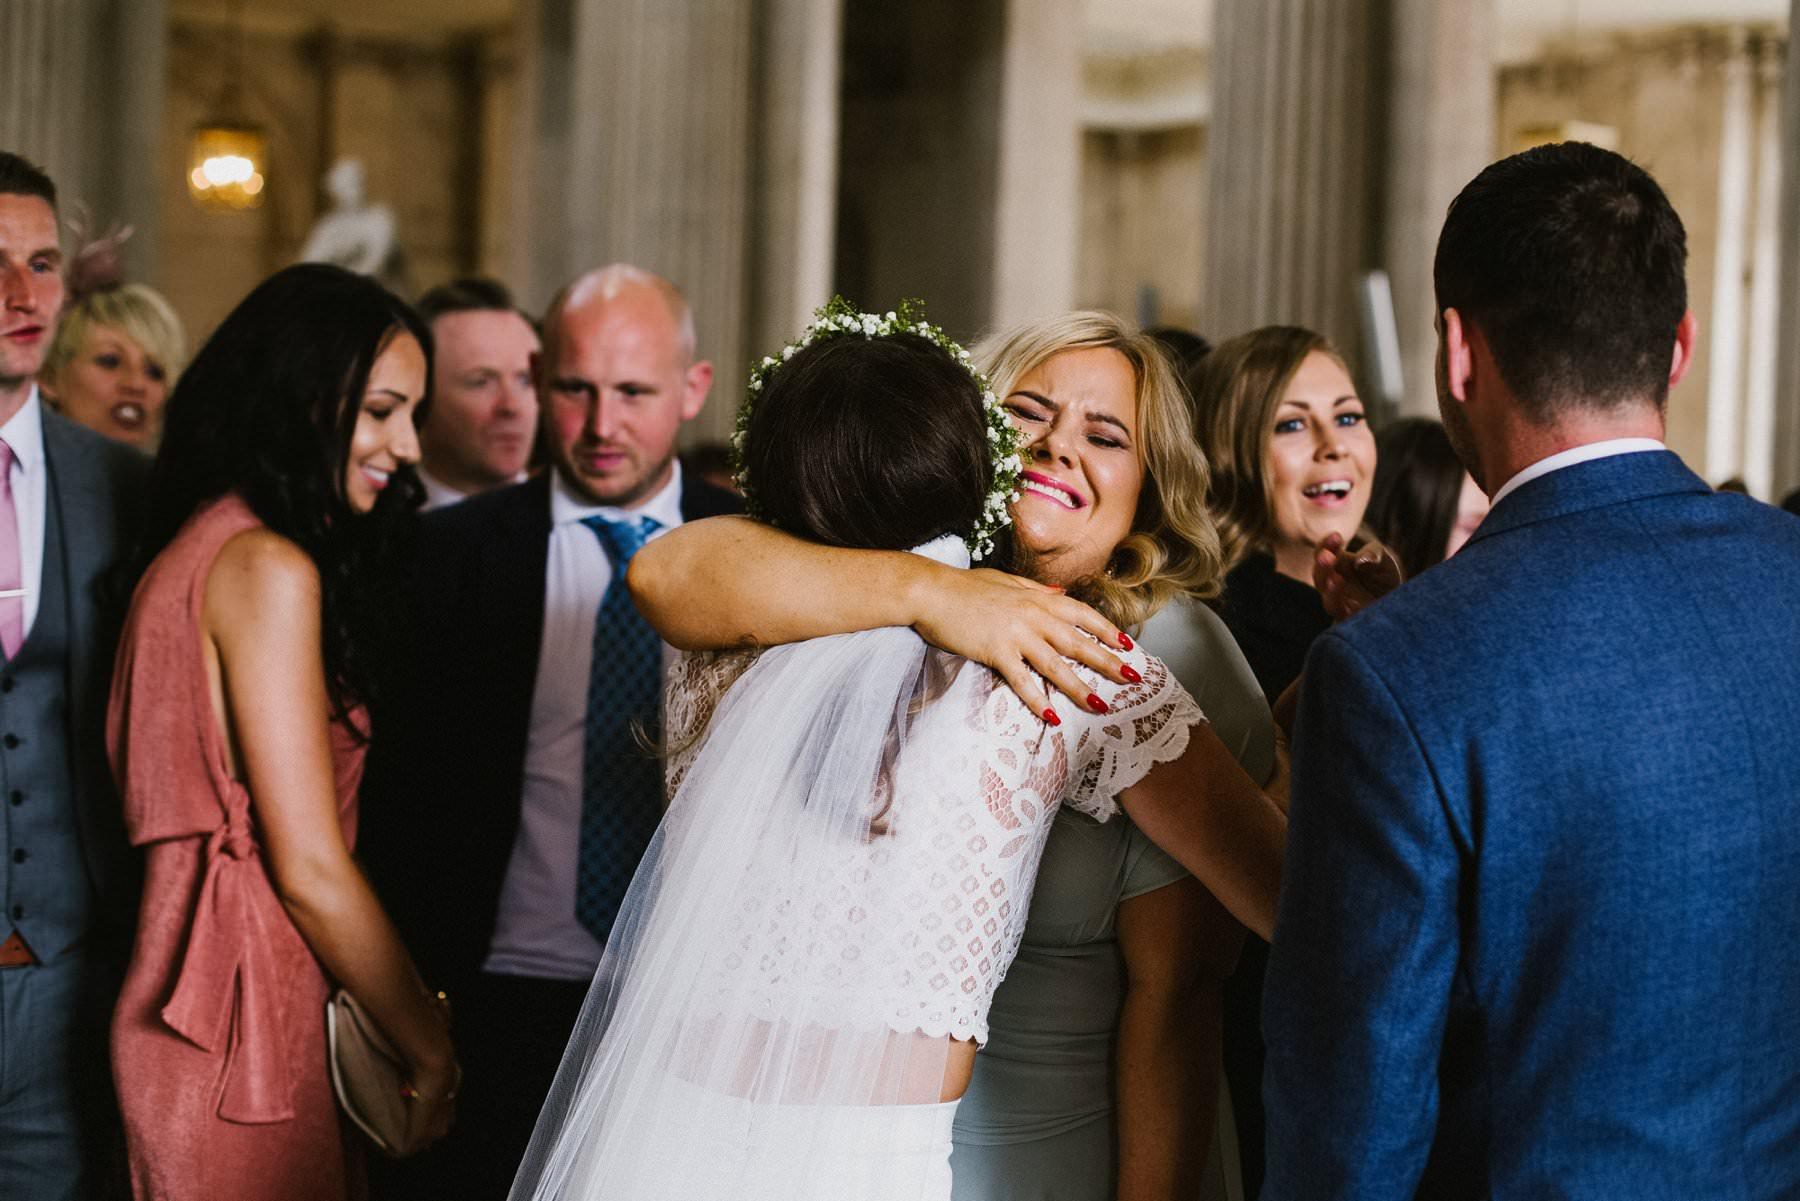 bride receives emotive hug from wedding guest at Dublin City Hall wedding